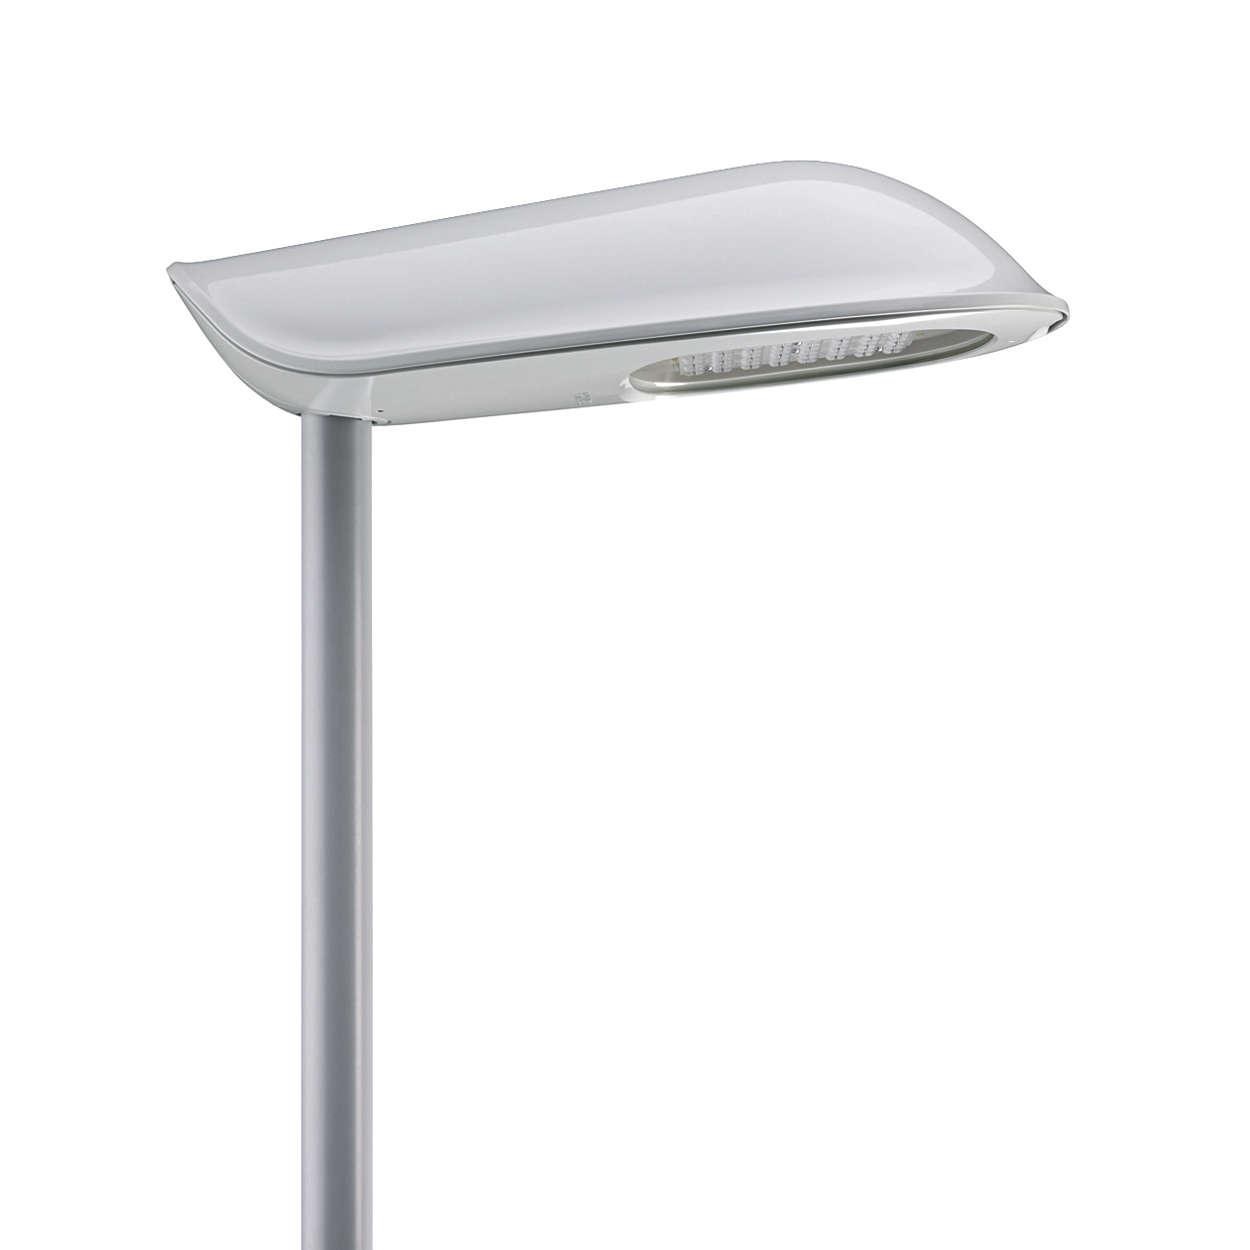 Iridium² LEDGINE – iluminăm drumul înainte